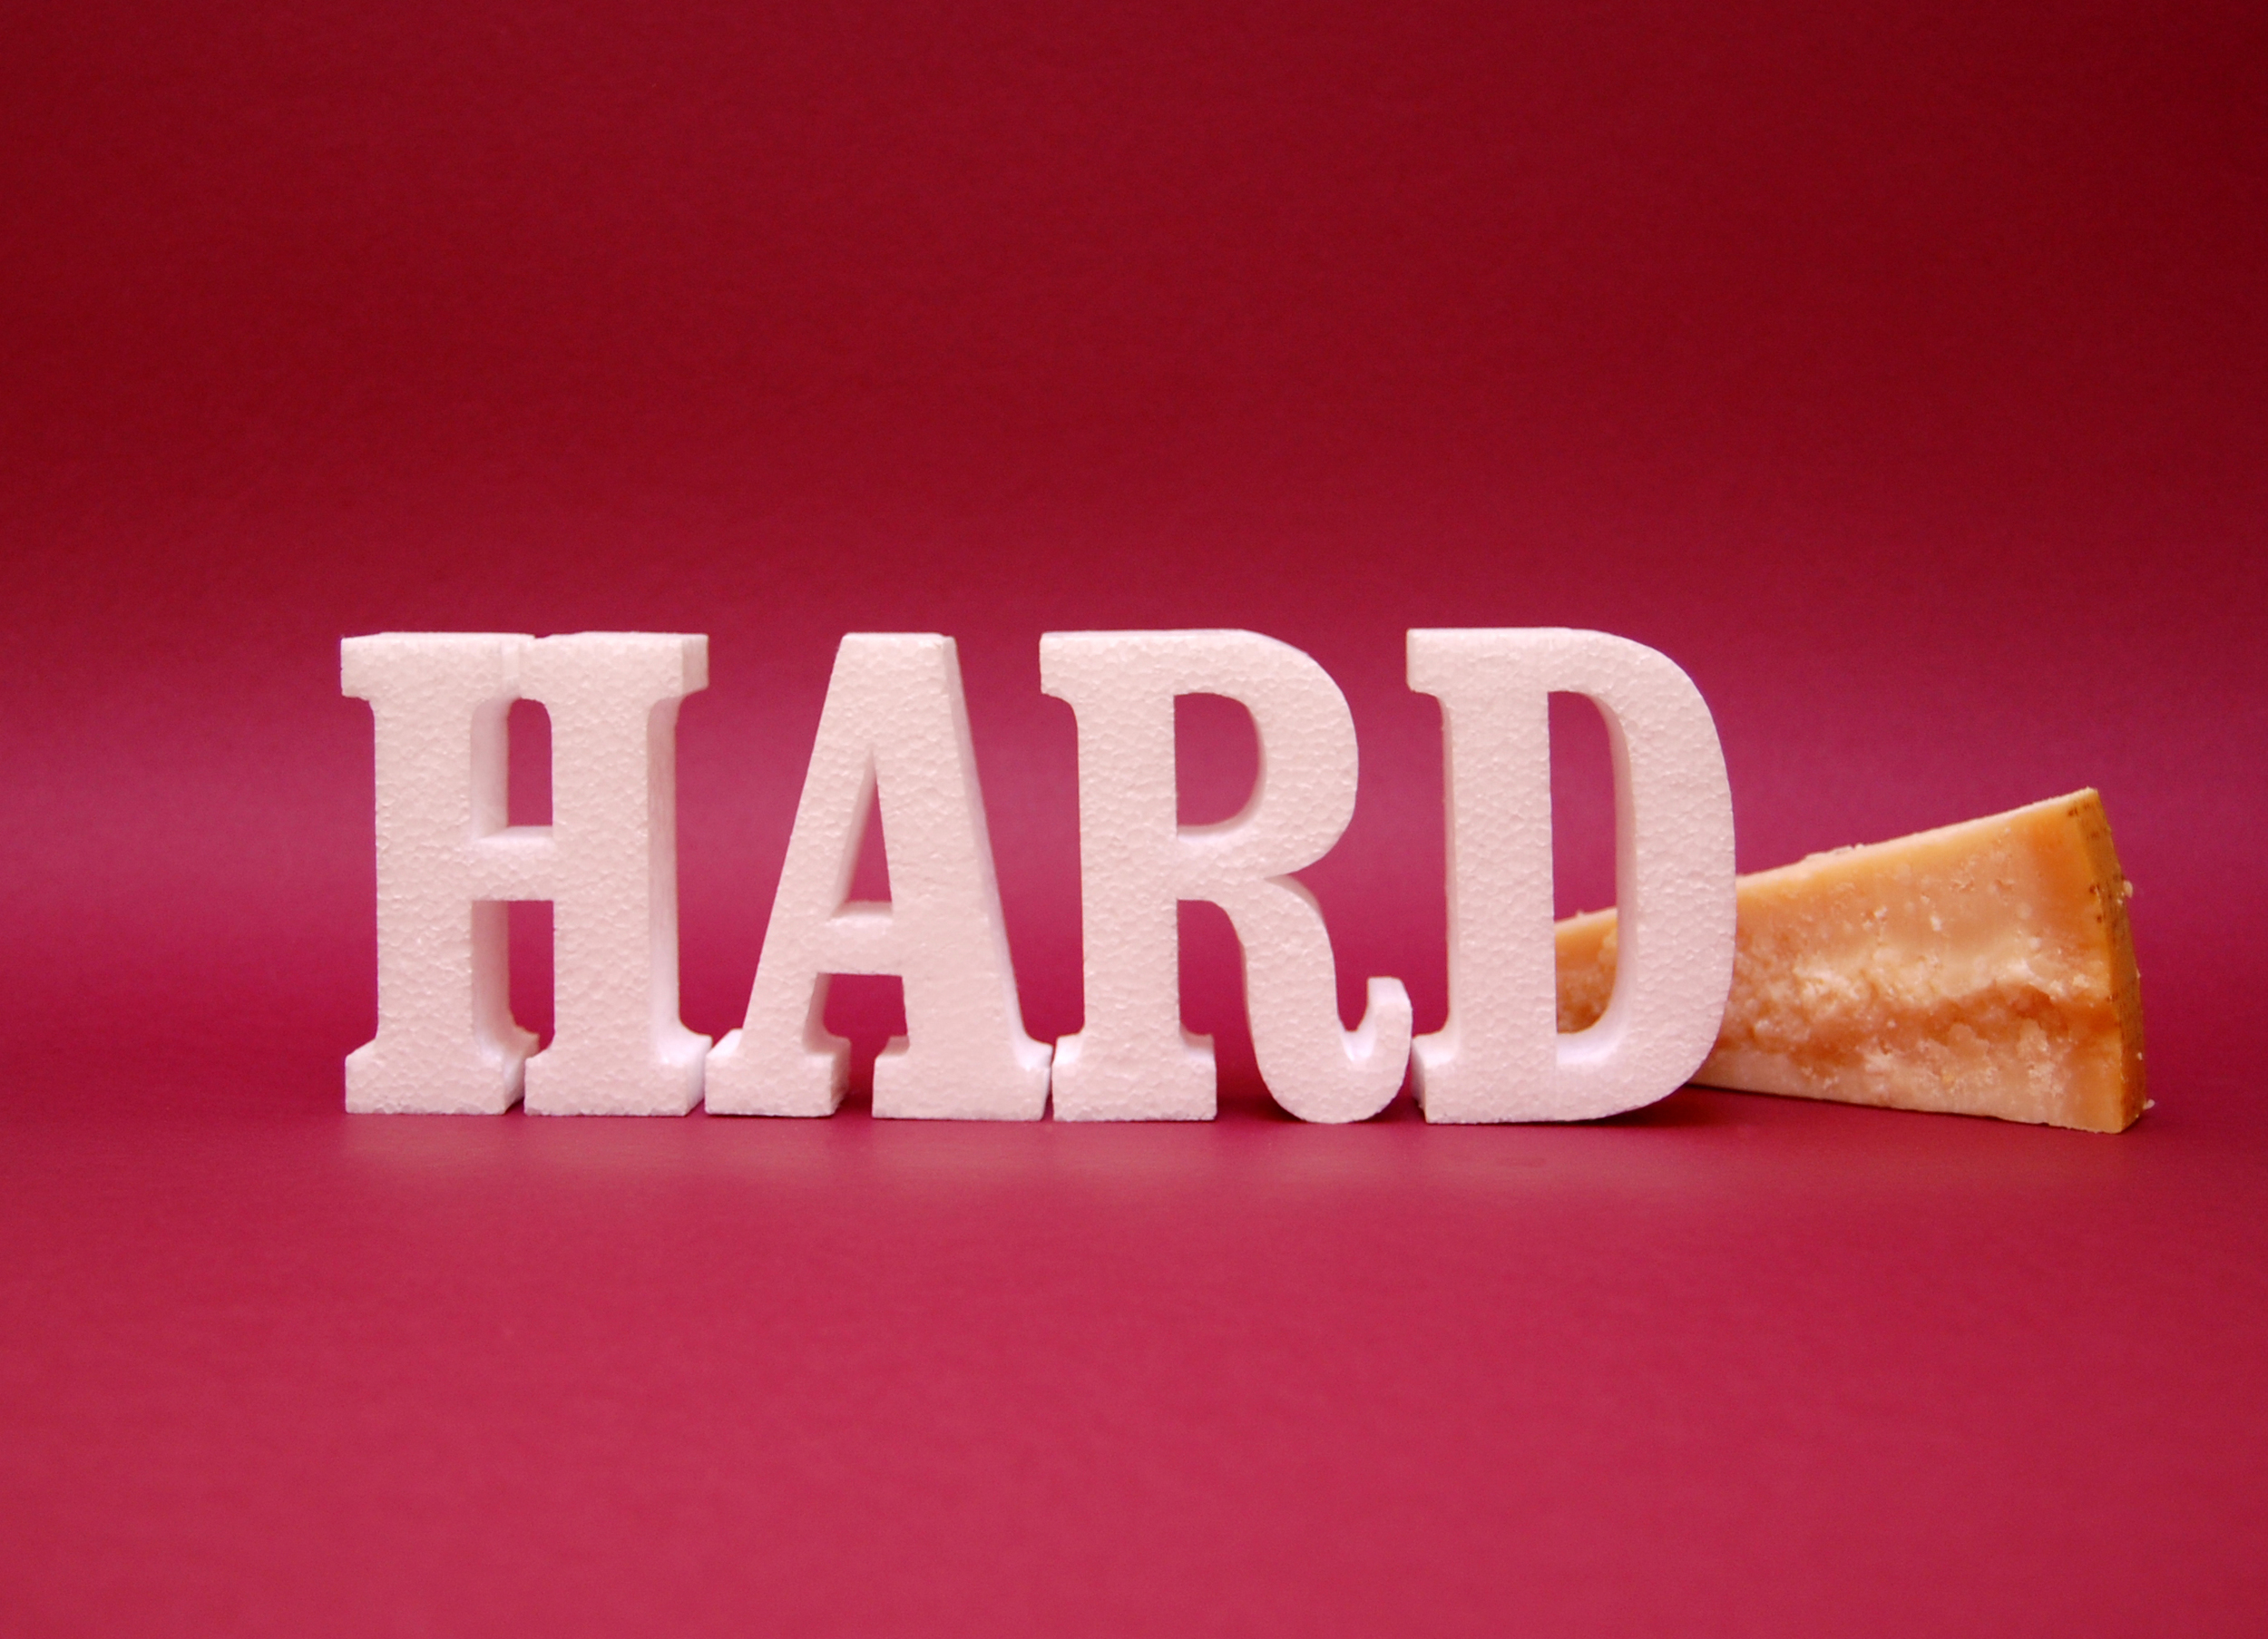 HARD CHEESE.jpg